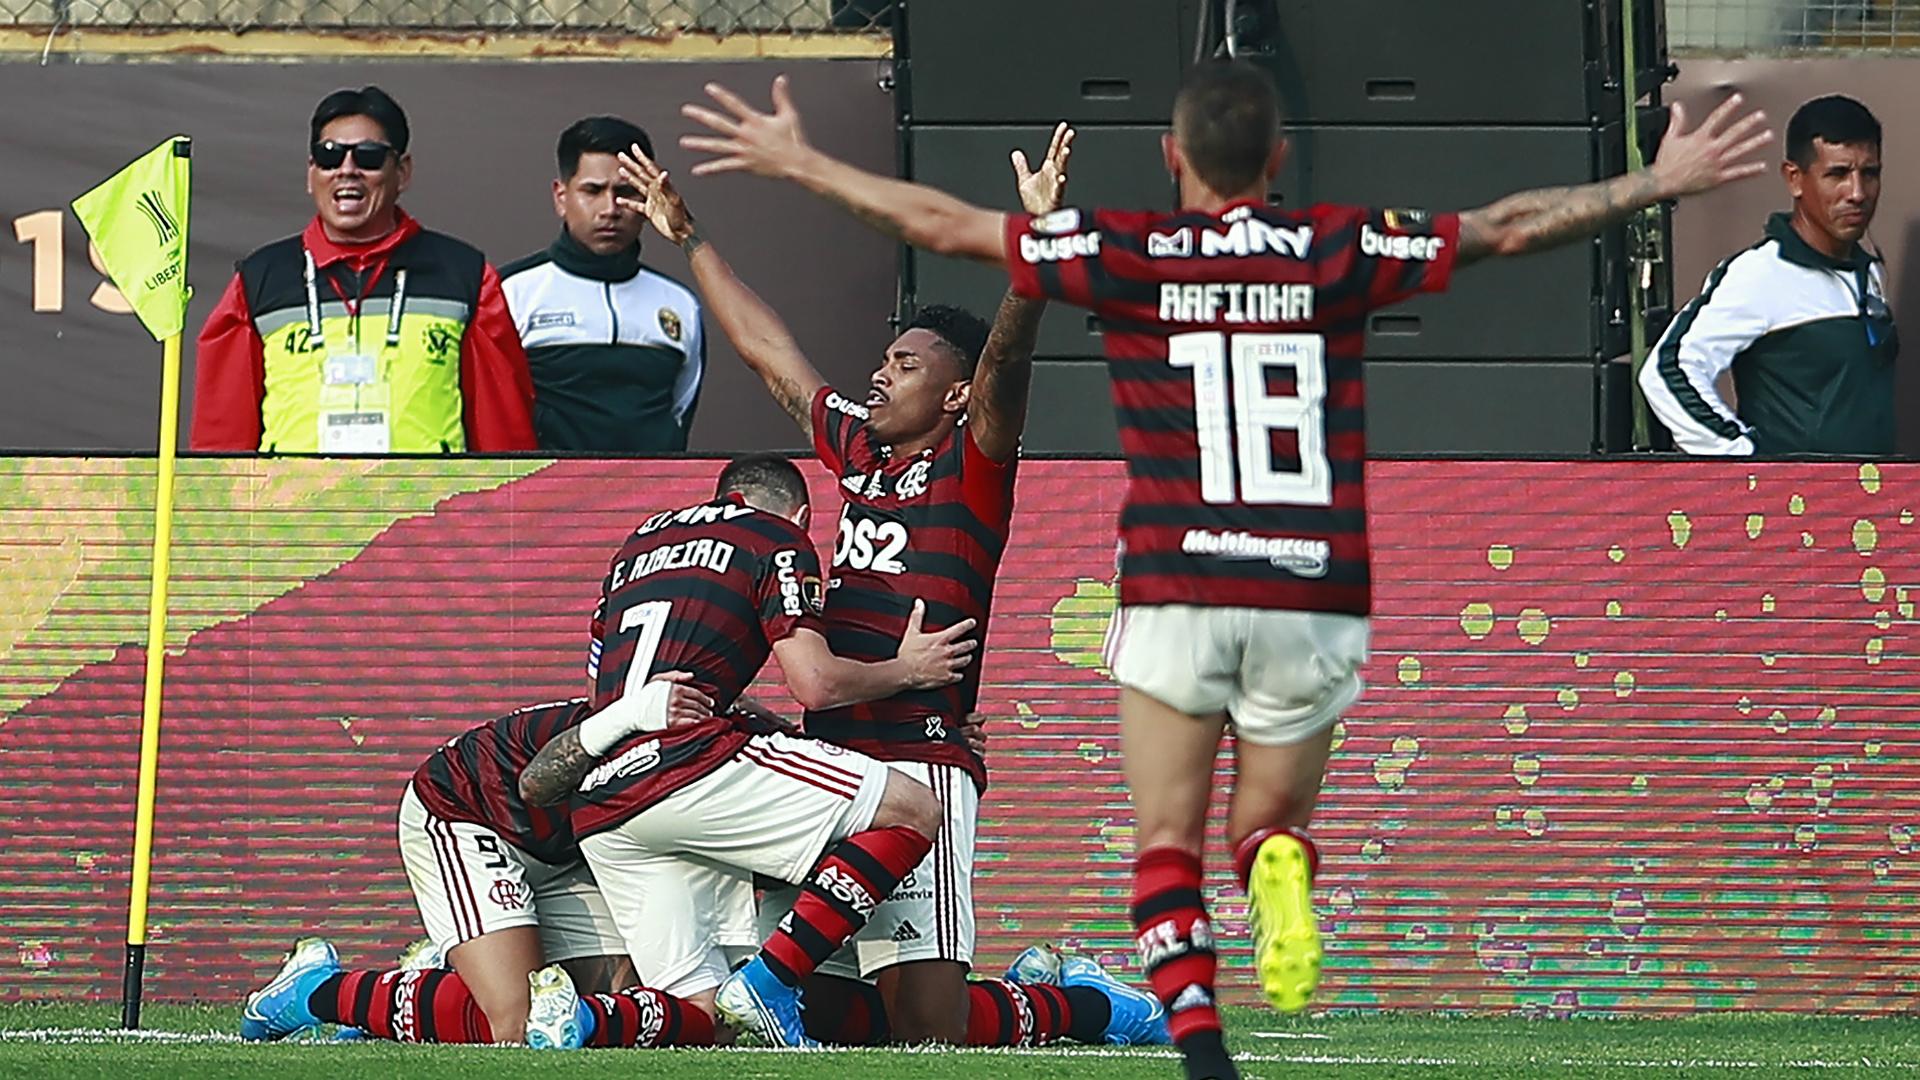 Flamengo 2-1 River Plate: Gabriel stuns Gallardo's men to snatch Copa Libertadores glory